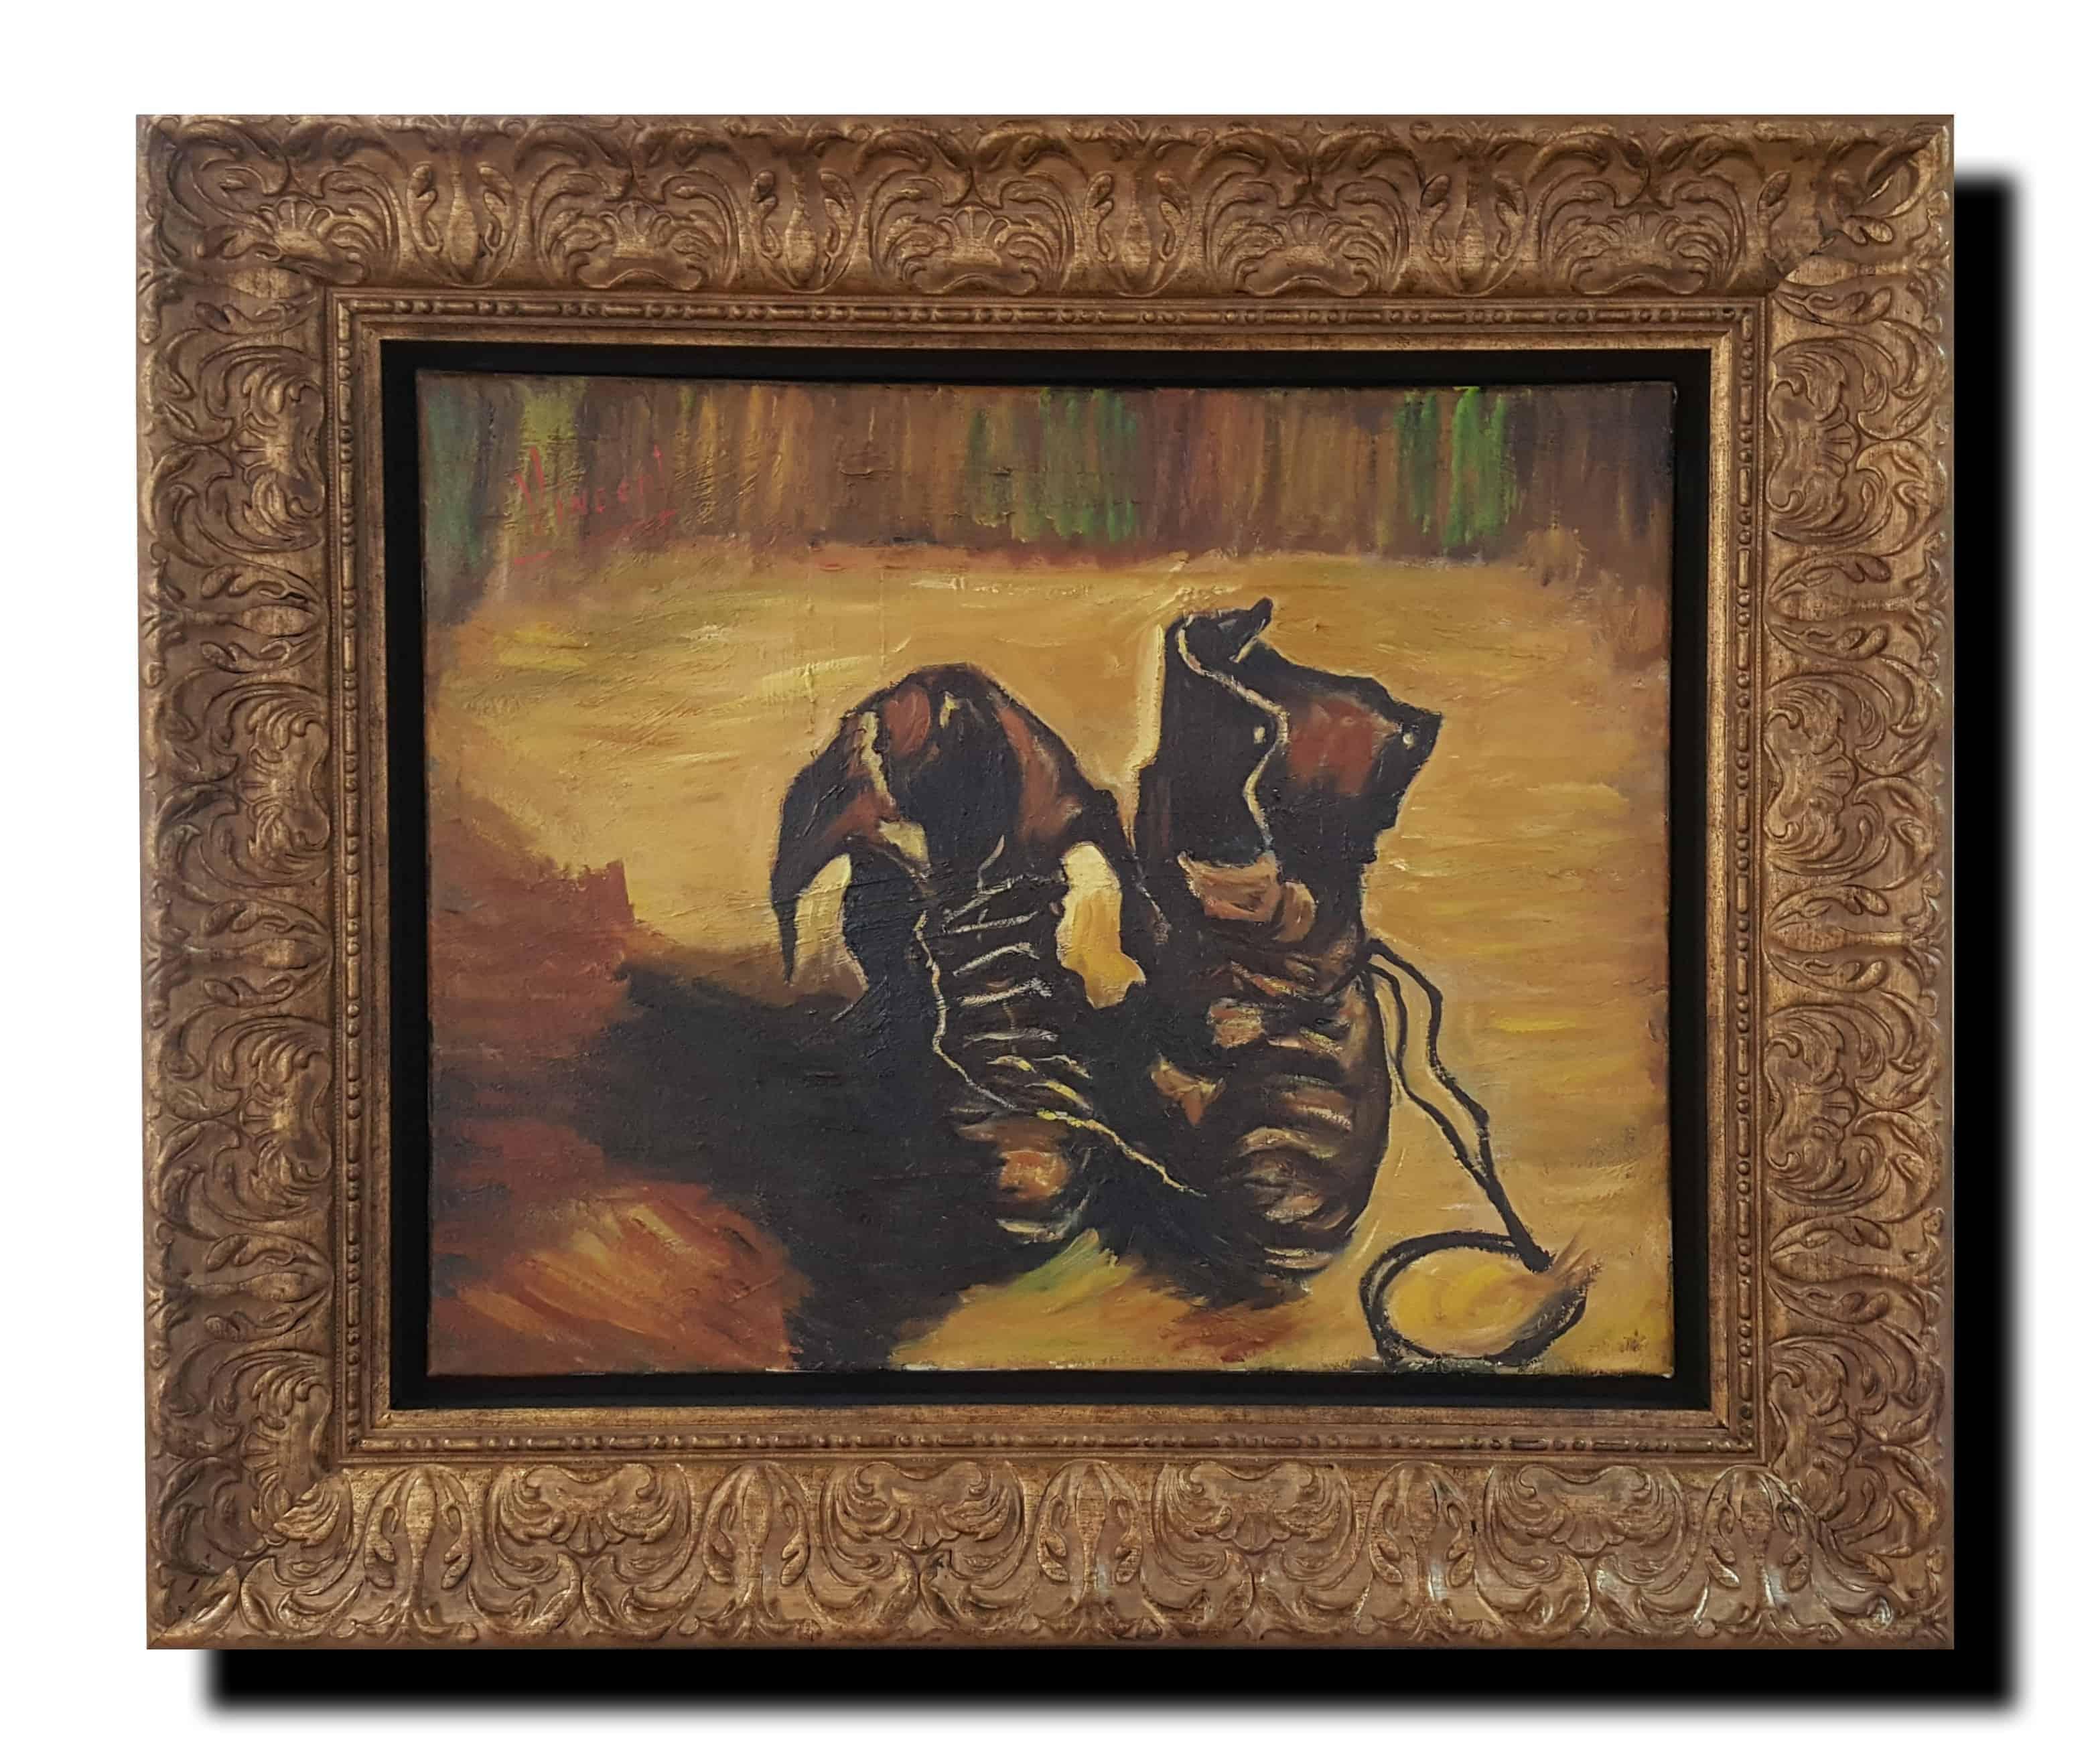 Van Gogh's Boots